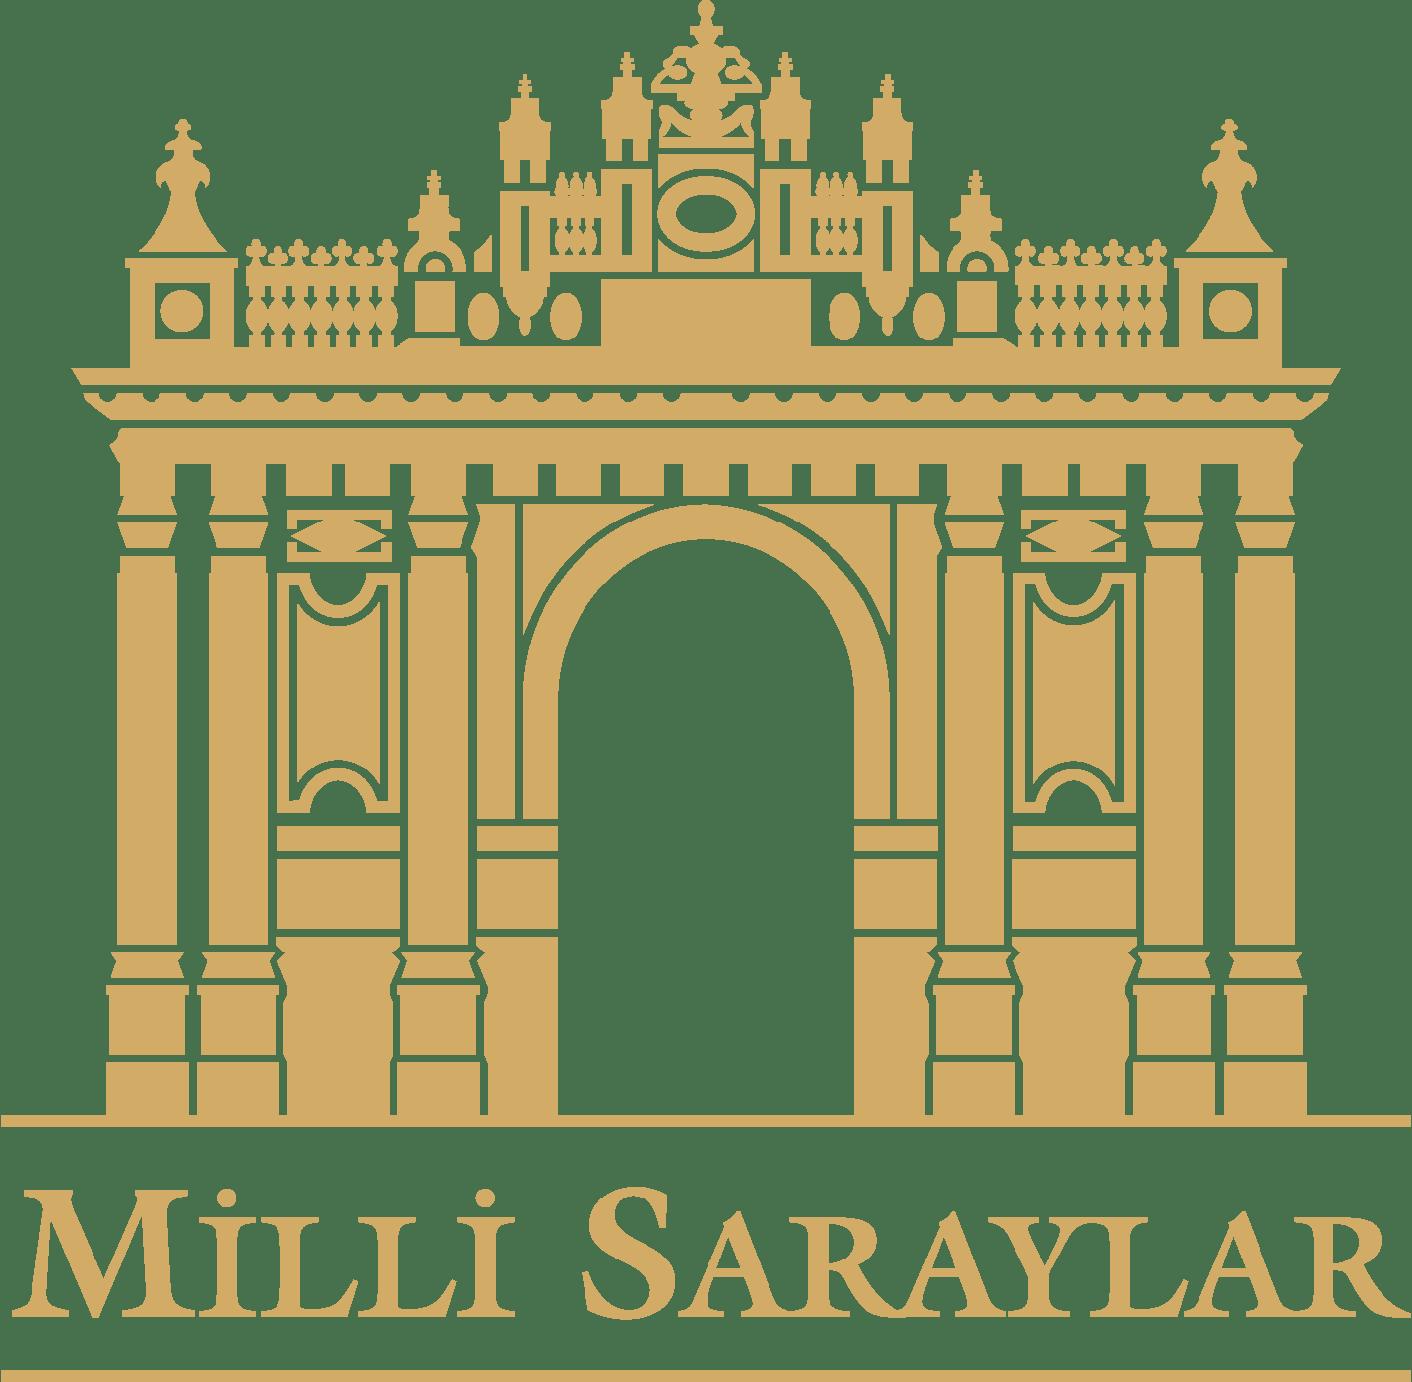 Milli Saraylar Logo png